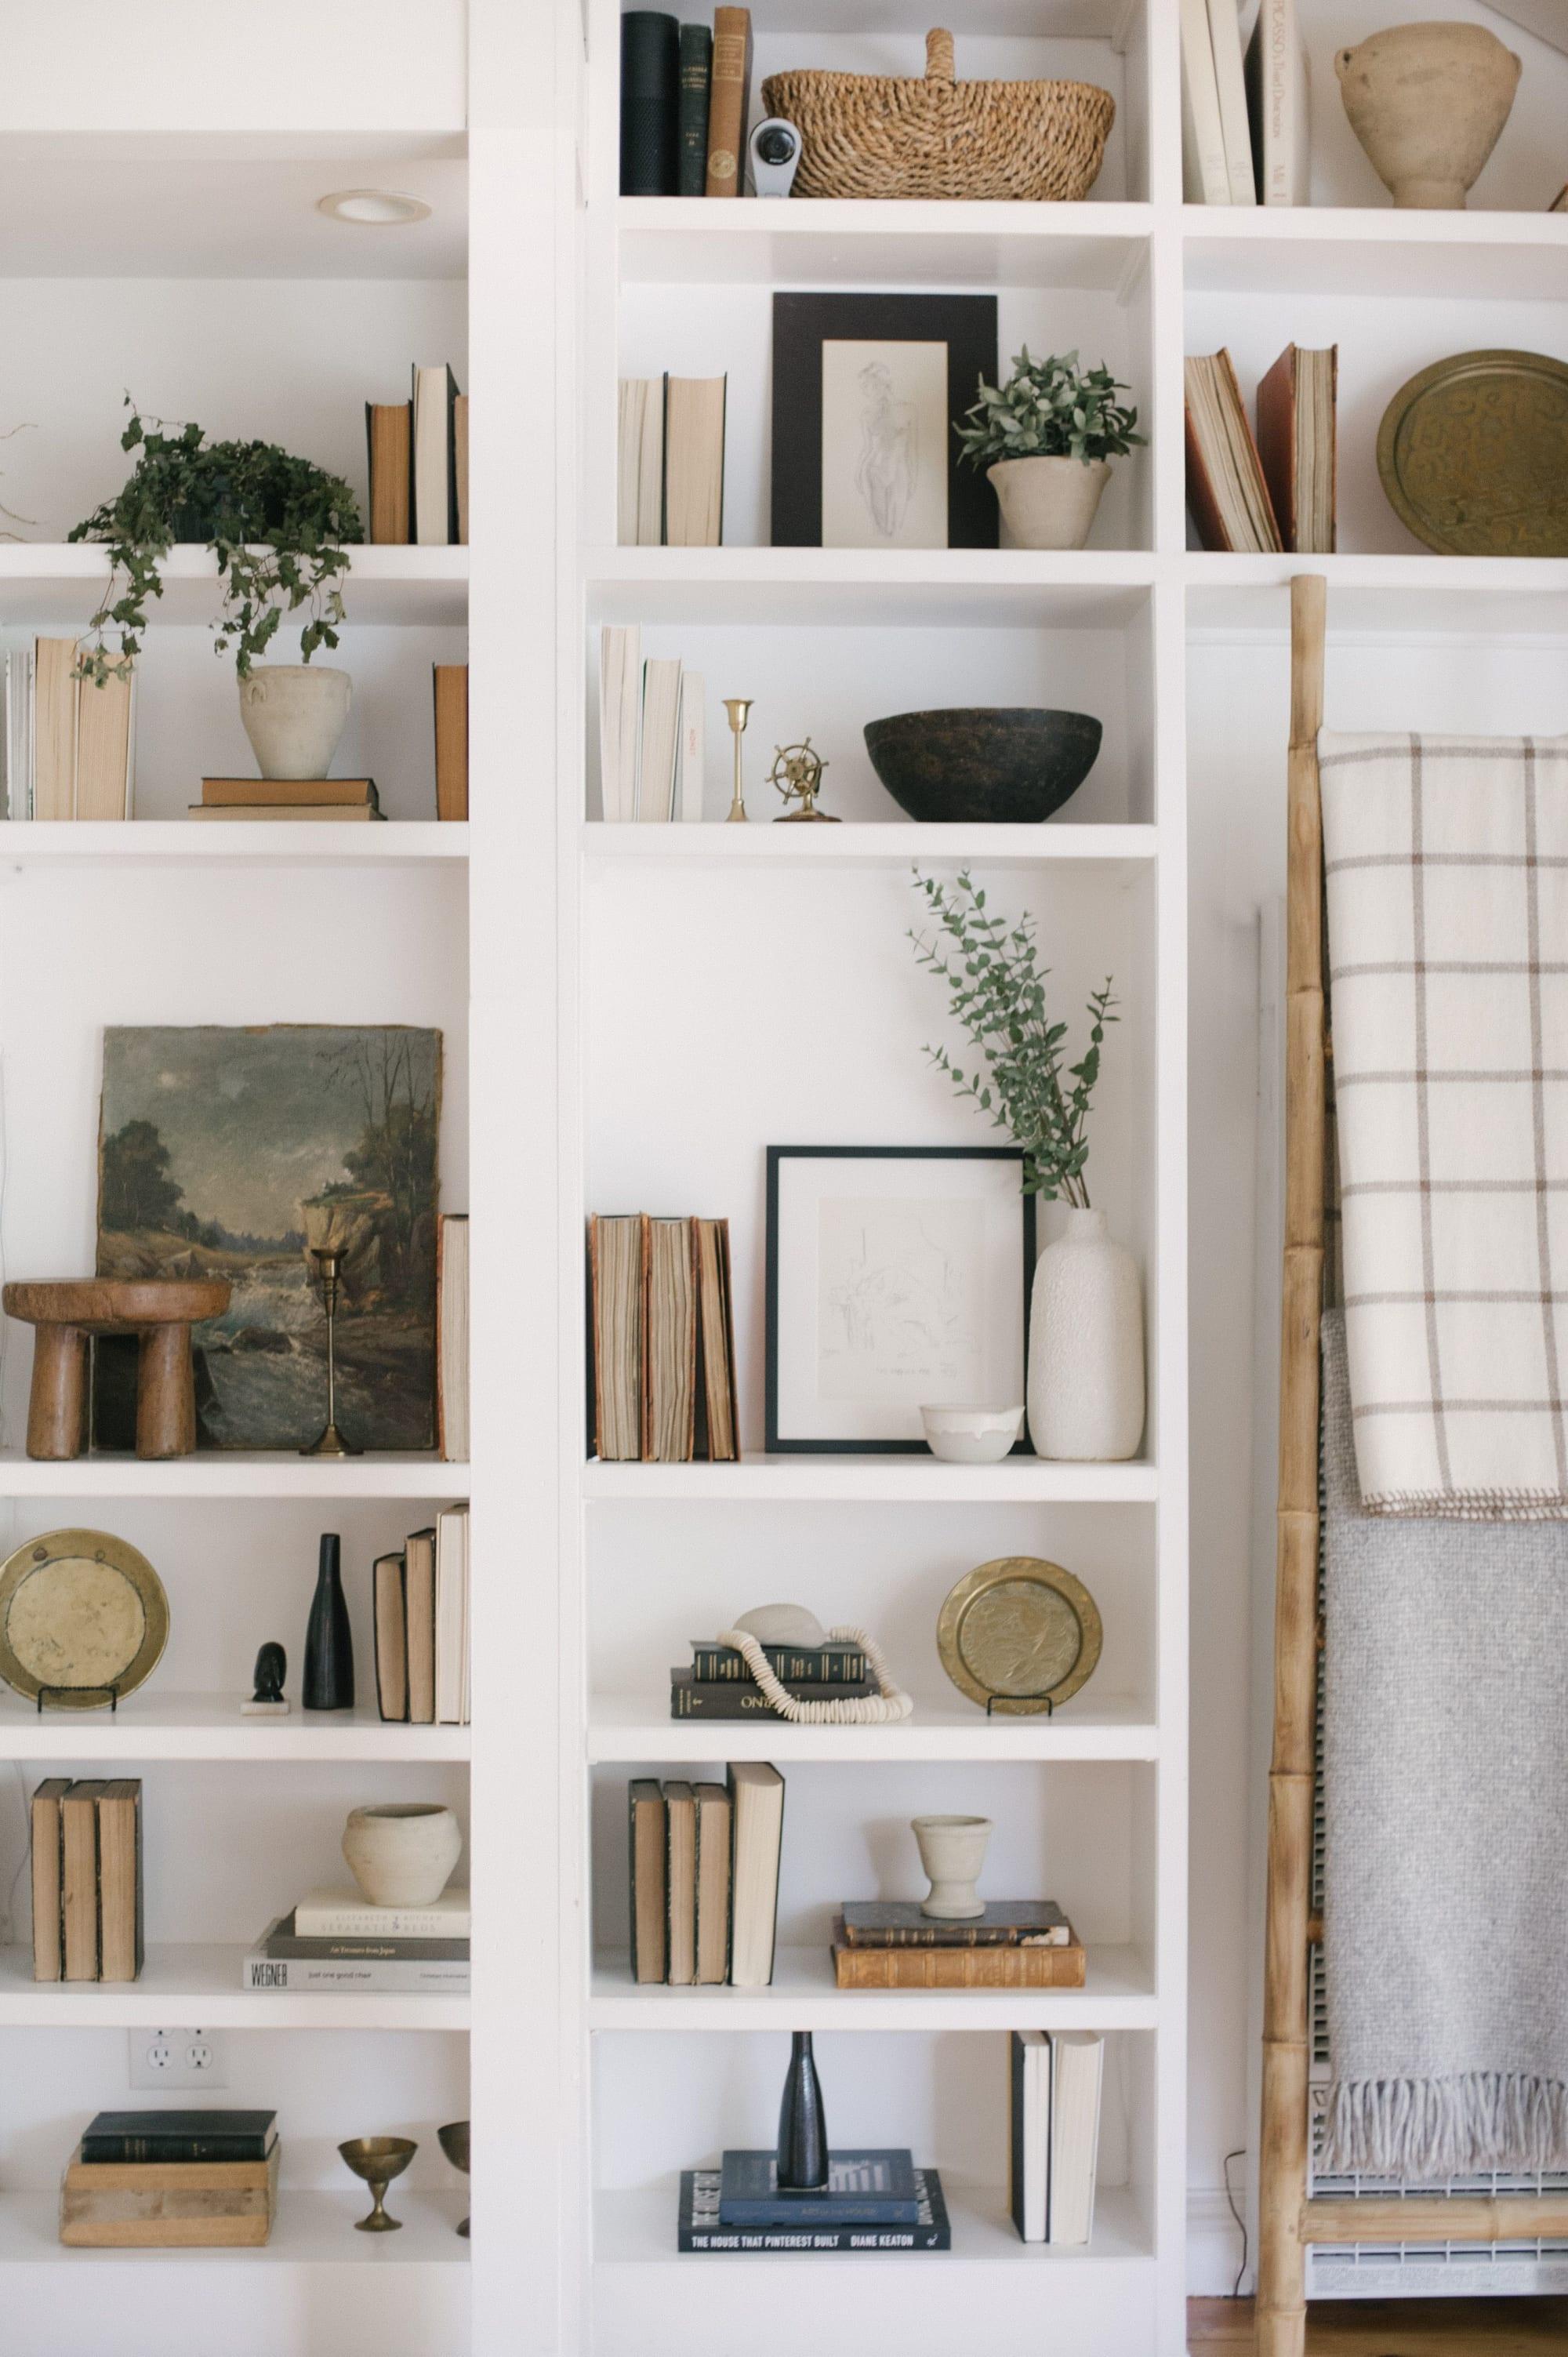 White shelves, organized decorations